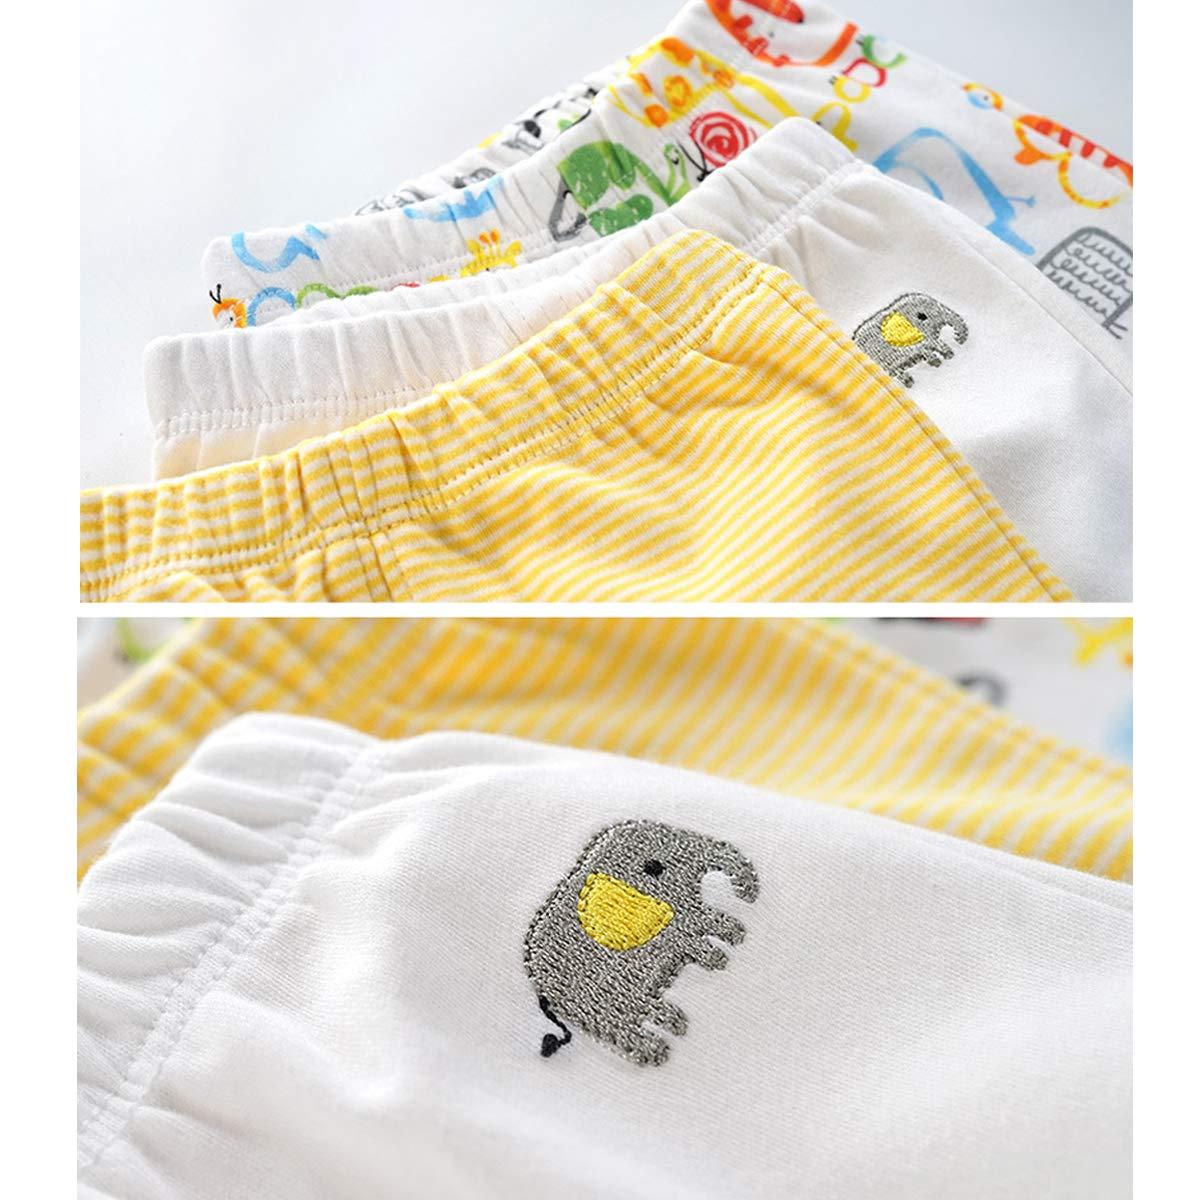 3er Pack Baby Strampelhose Babyhose mit Fu/ß Leggings f/ür Baby-Jungen Baumwolle Hosen 6-12 Monate